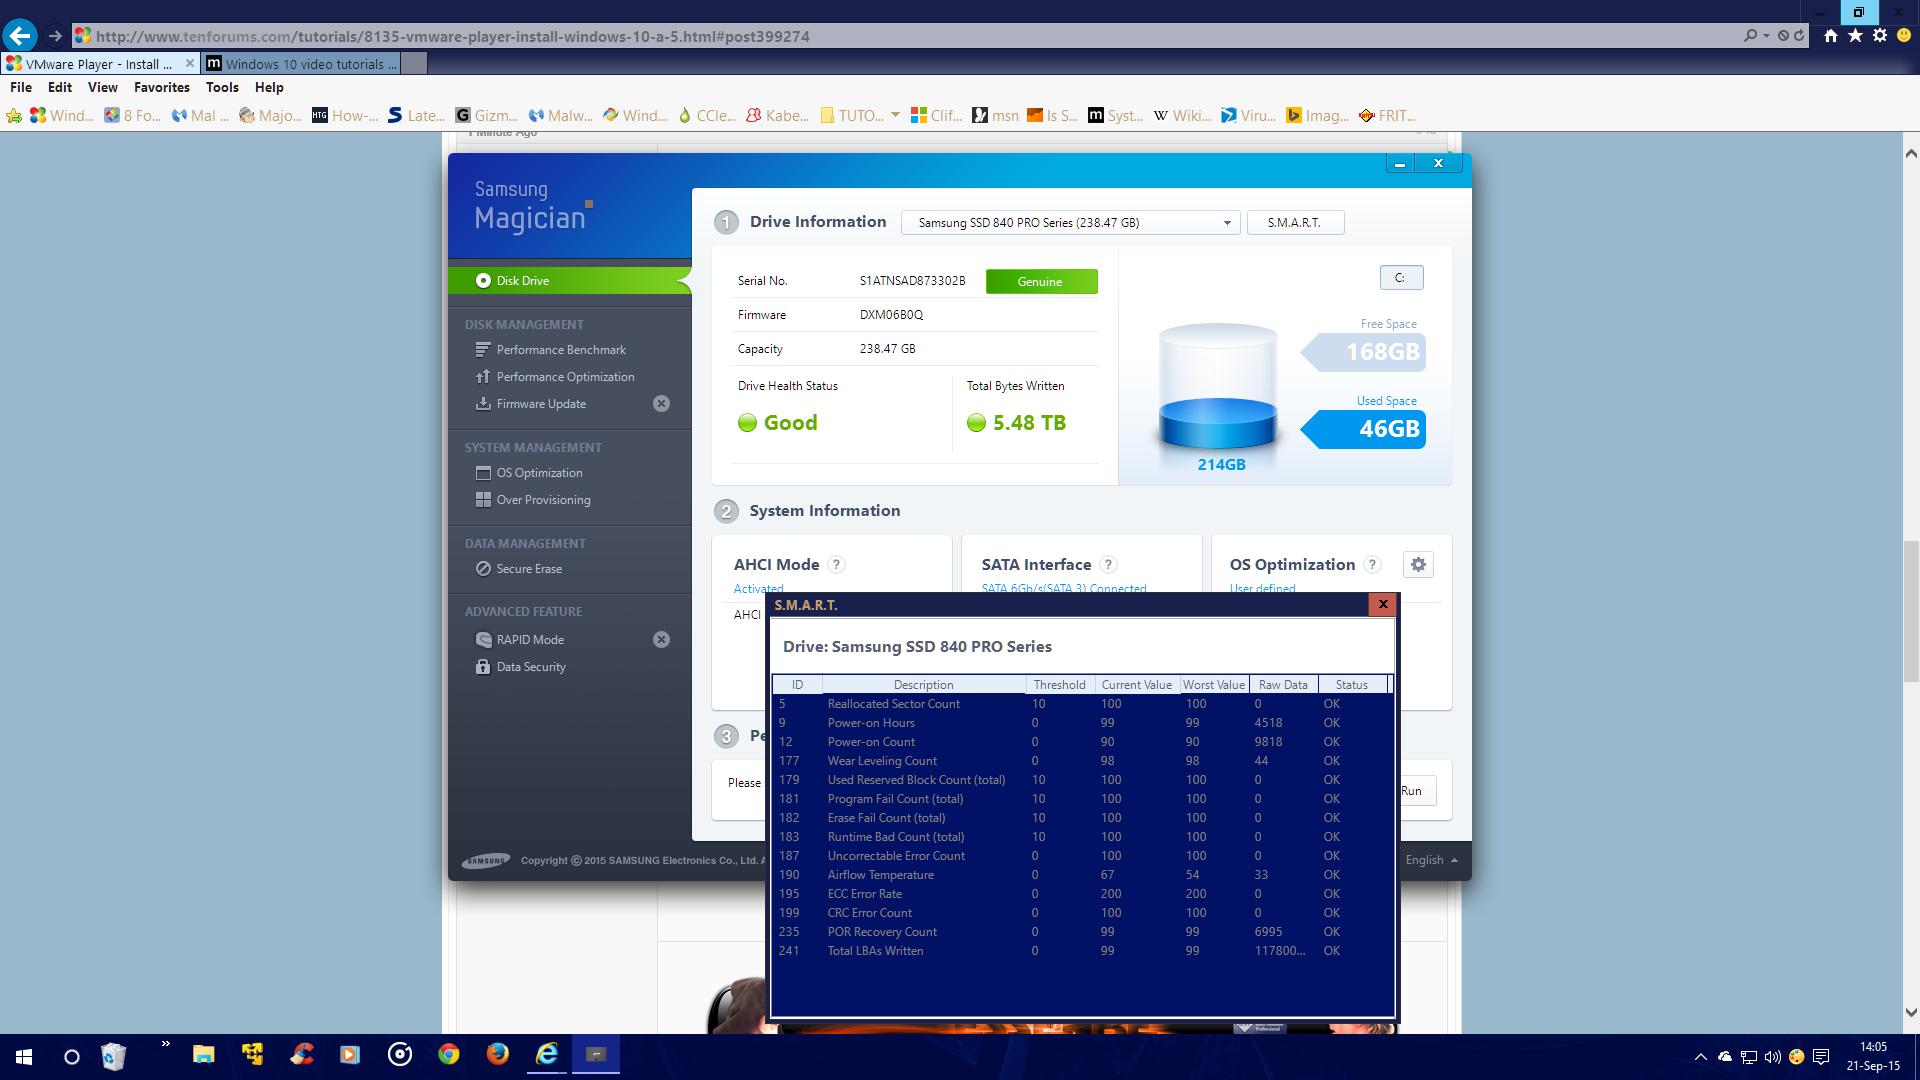 Install Windows 10 as Virtual Machine in VMware Player